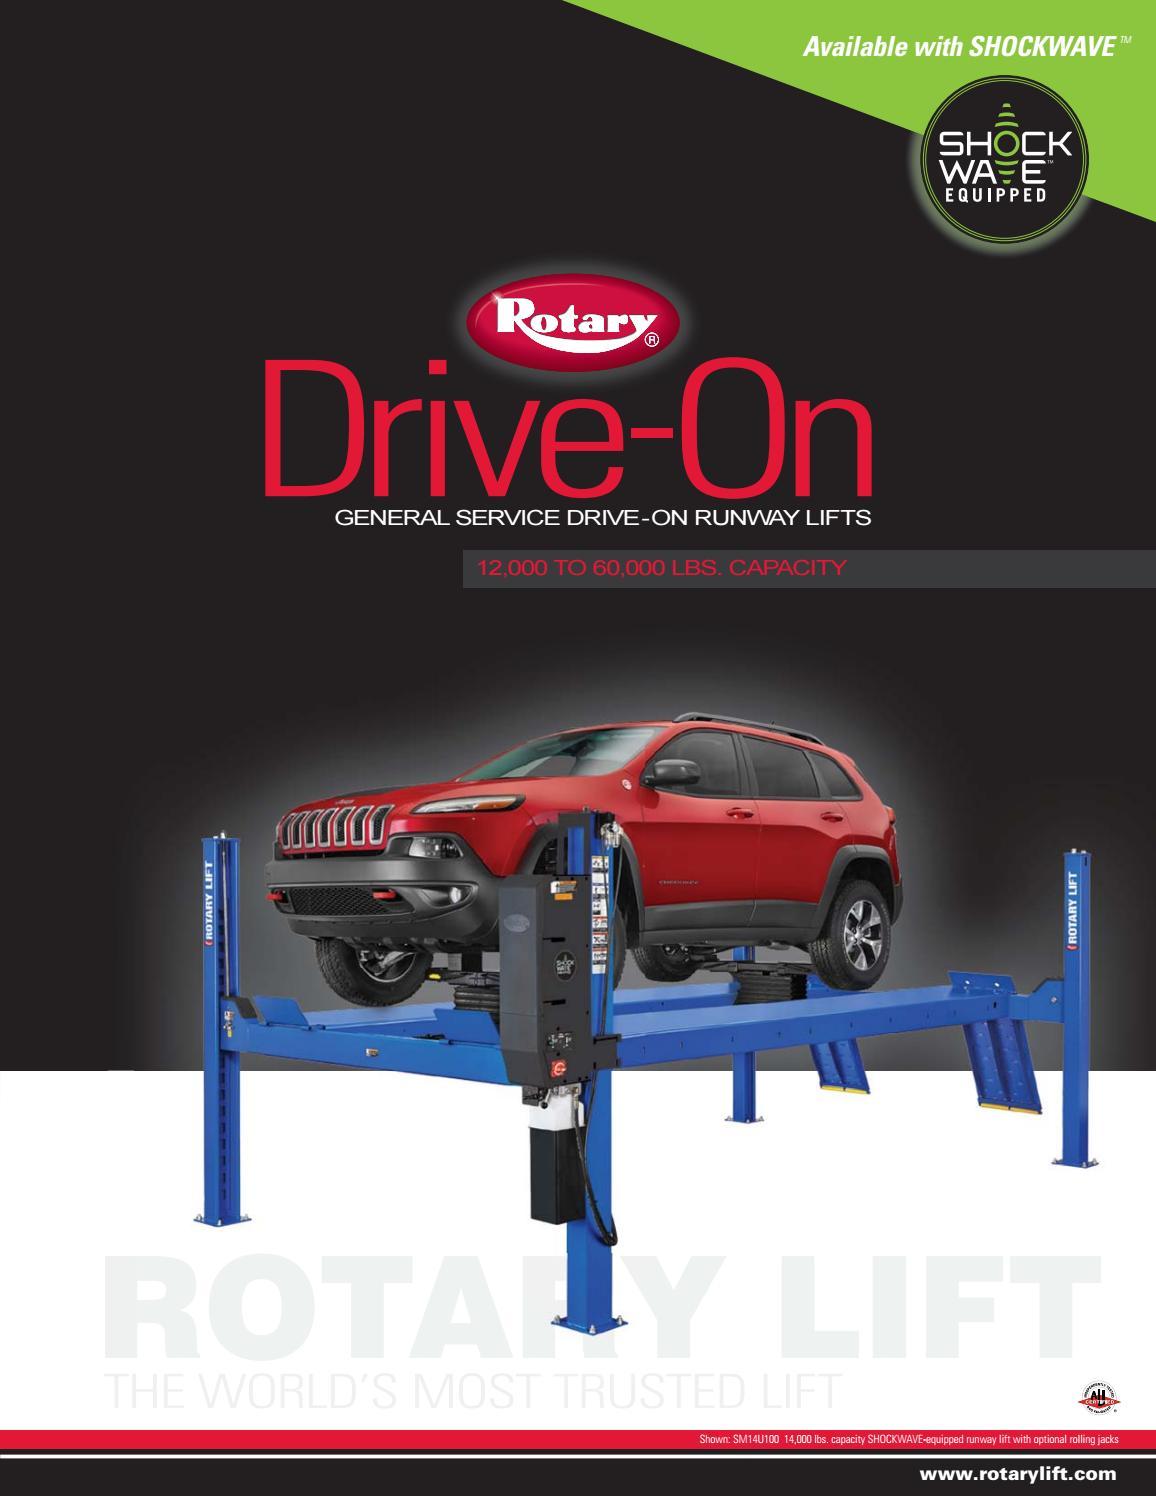 30 shims 2-Post 4-Post Surface Mount Auto Lift Installation Leveling Shim Kit